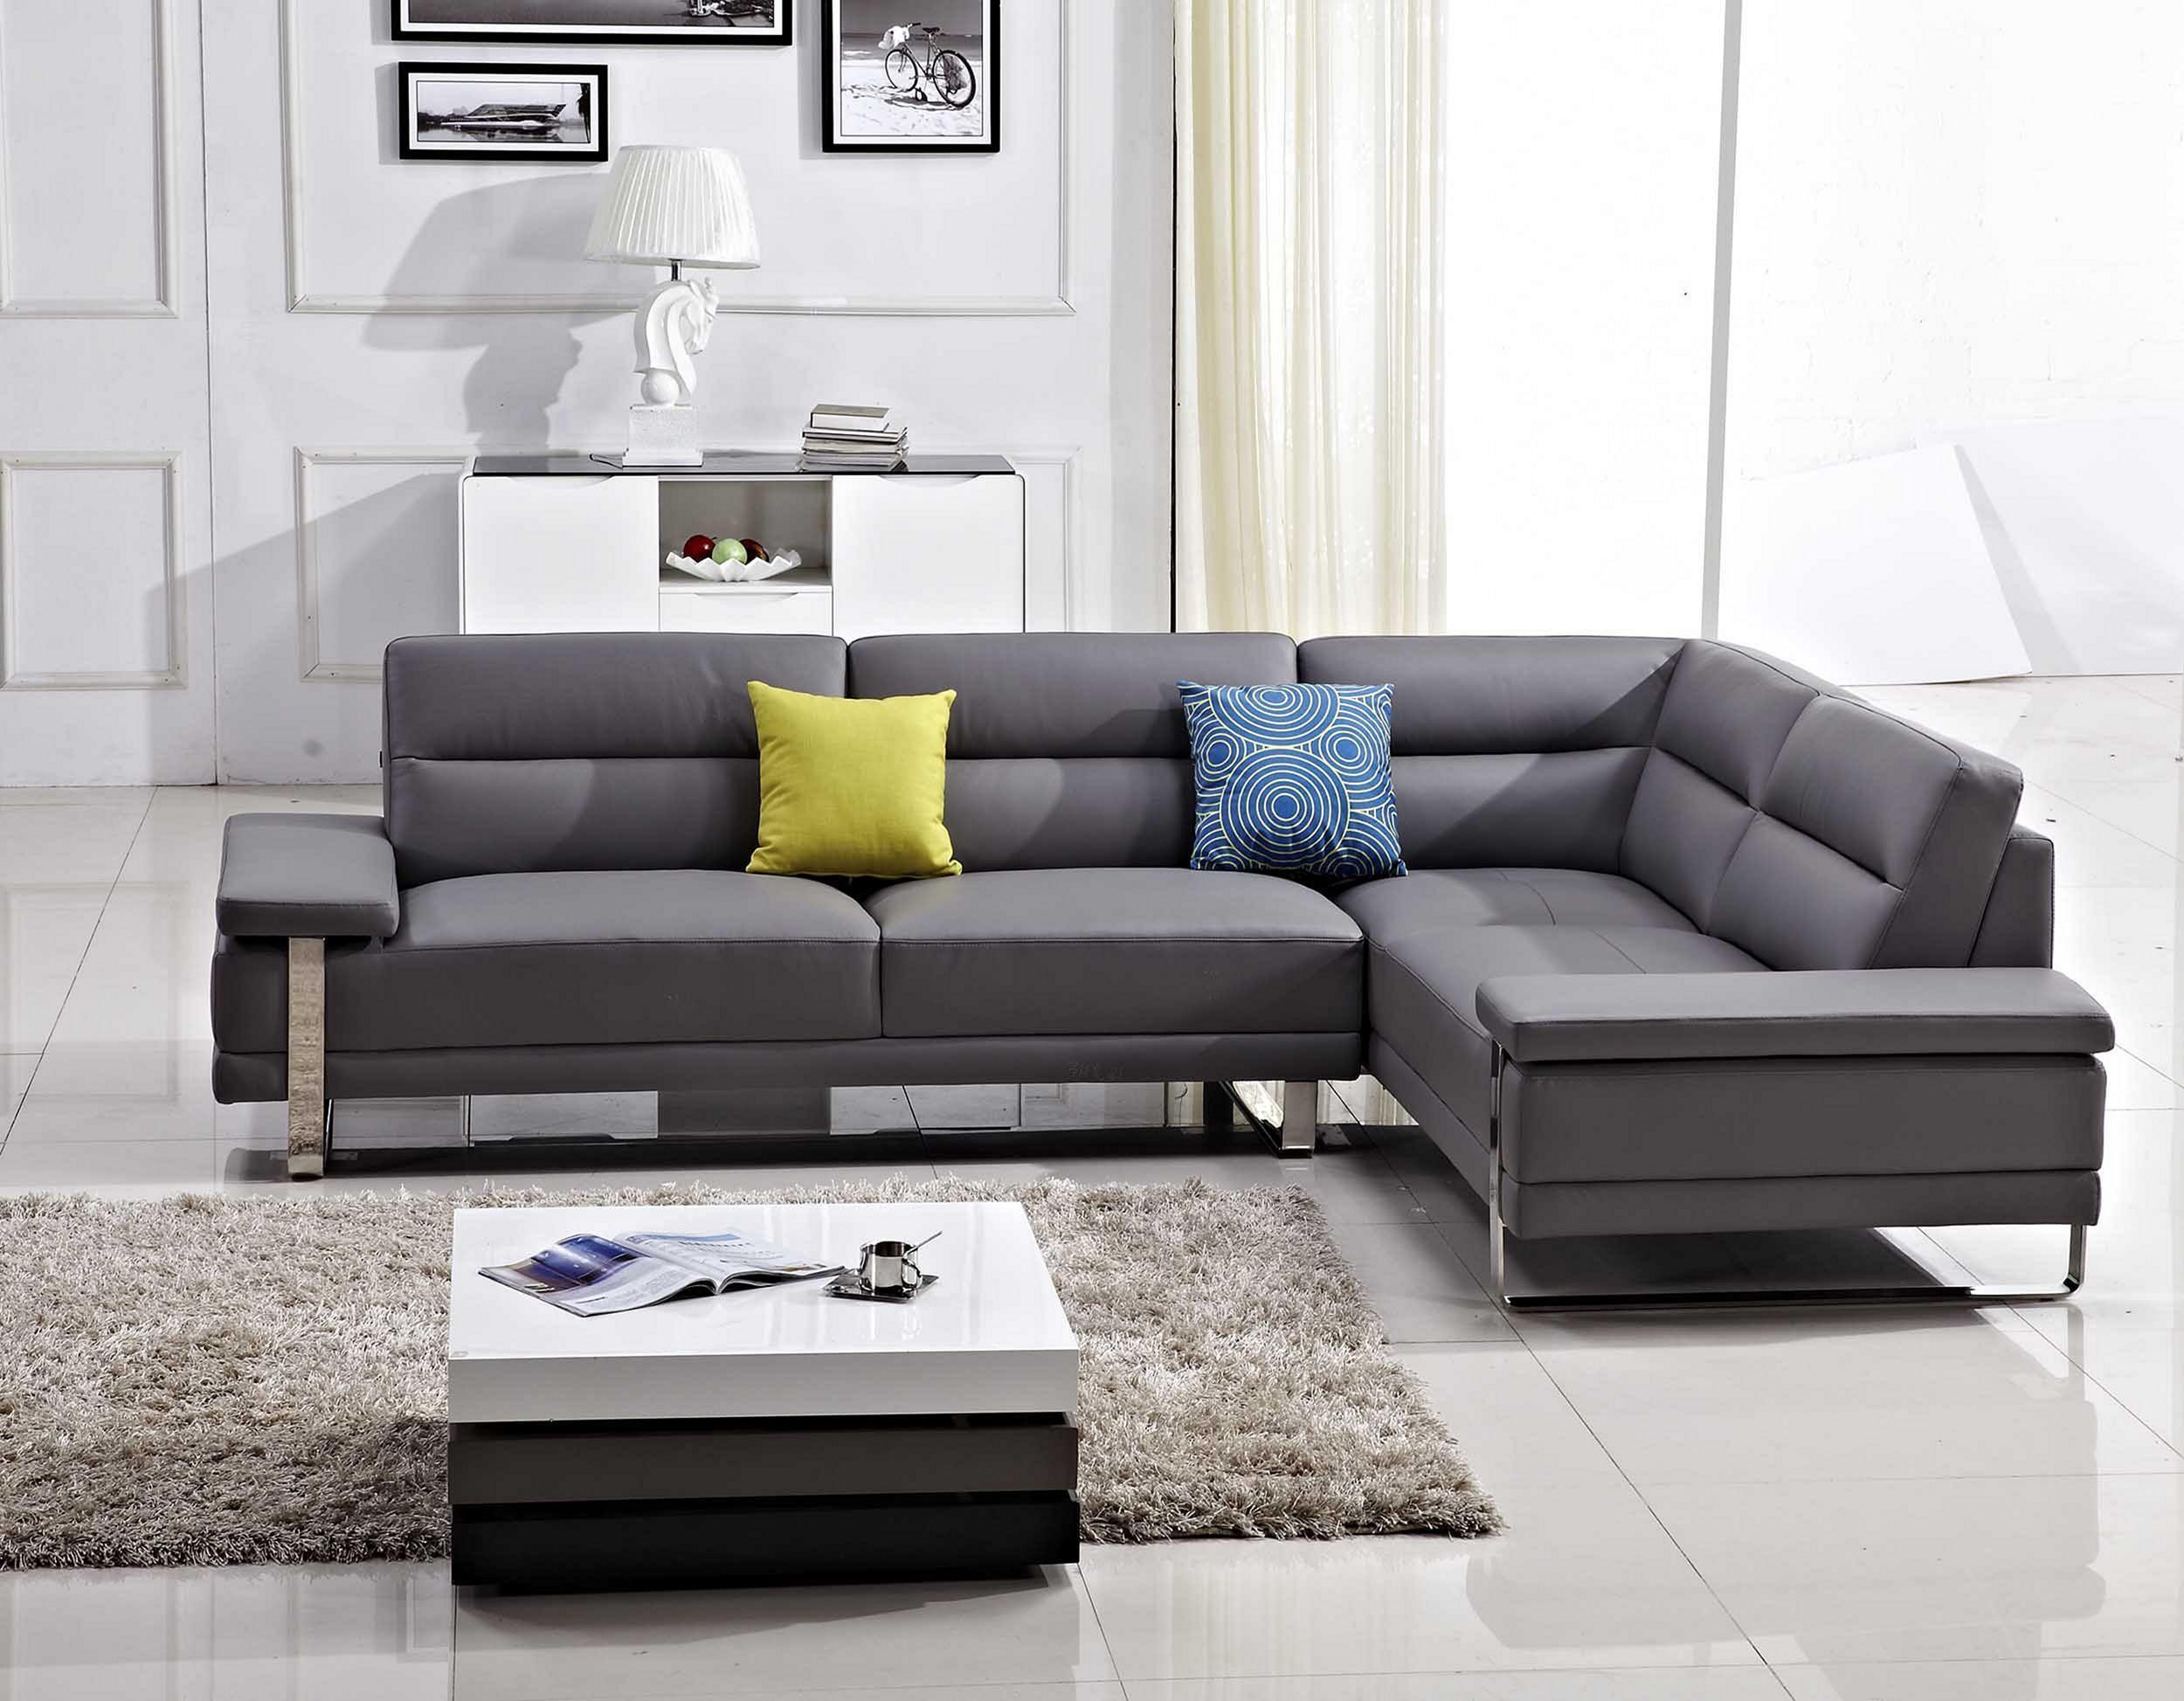 Pin By All Furnitures On Modern Furniture Inspiration Modern Sofa Living Room Corner Sofa Design Living Room Sofa Design